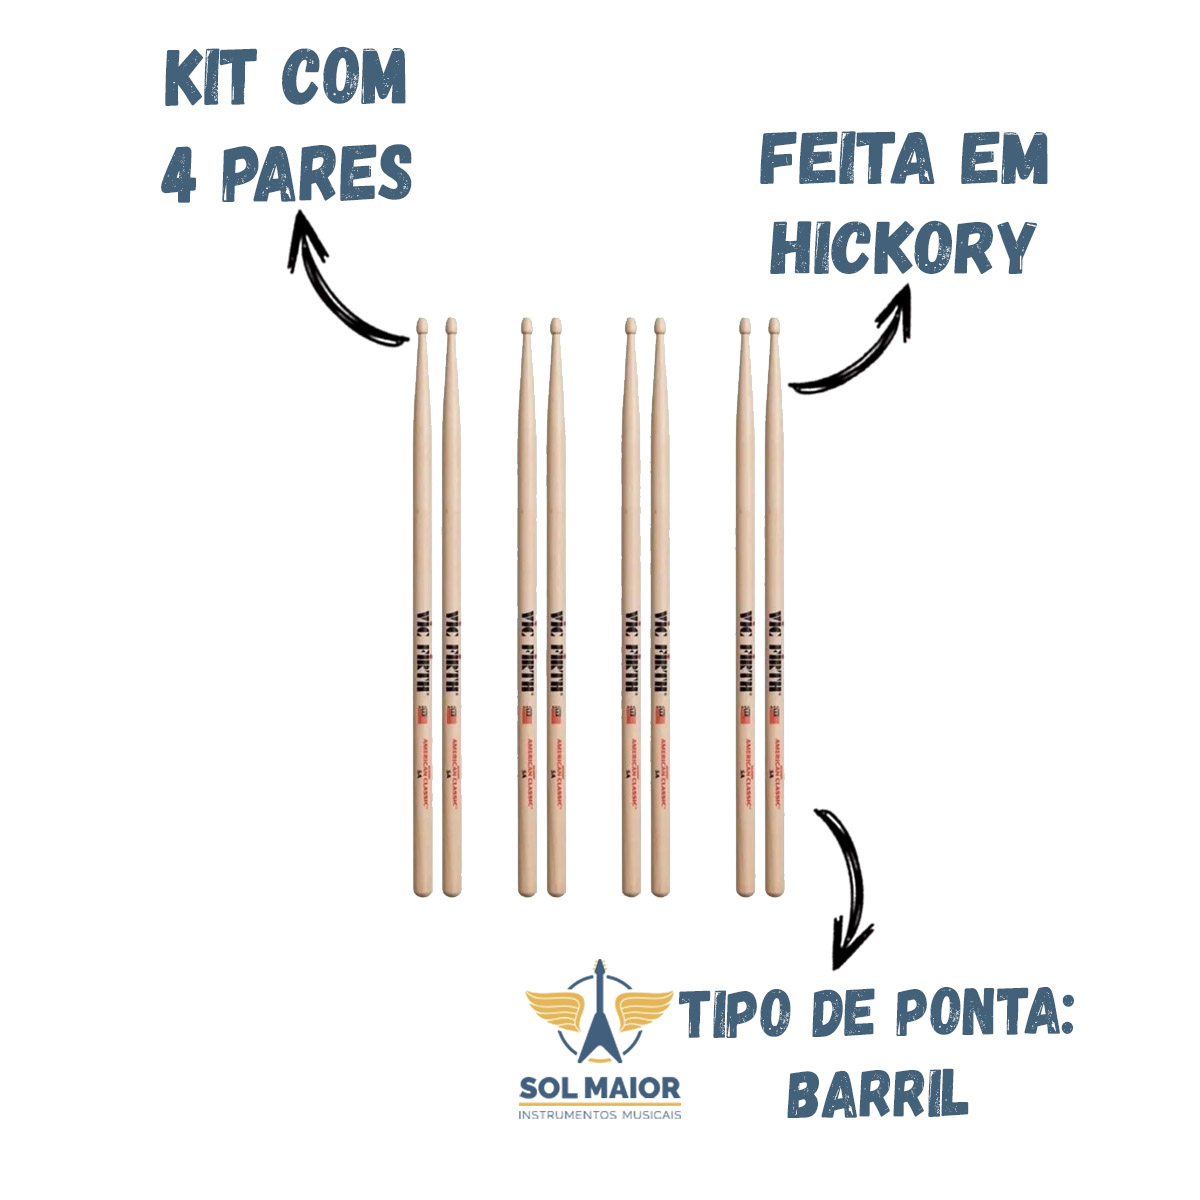 Kit com 4 Pares de Baqueta Vic Firth 5A American Hickory